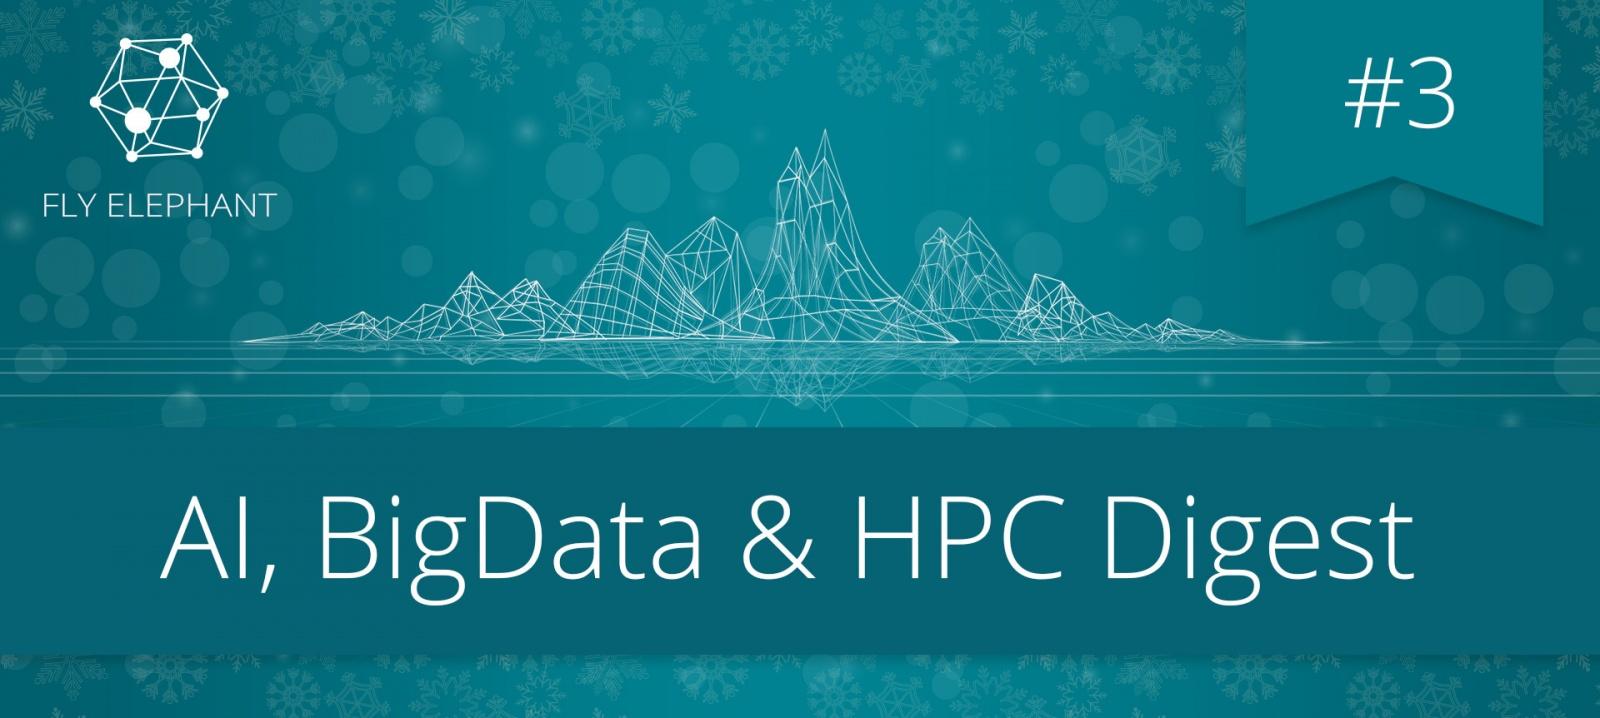 AI, BigData & HPC Digest #3 - 1